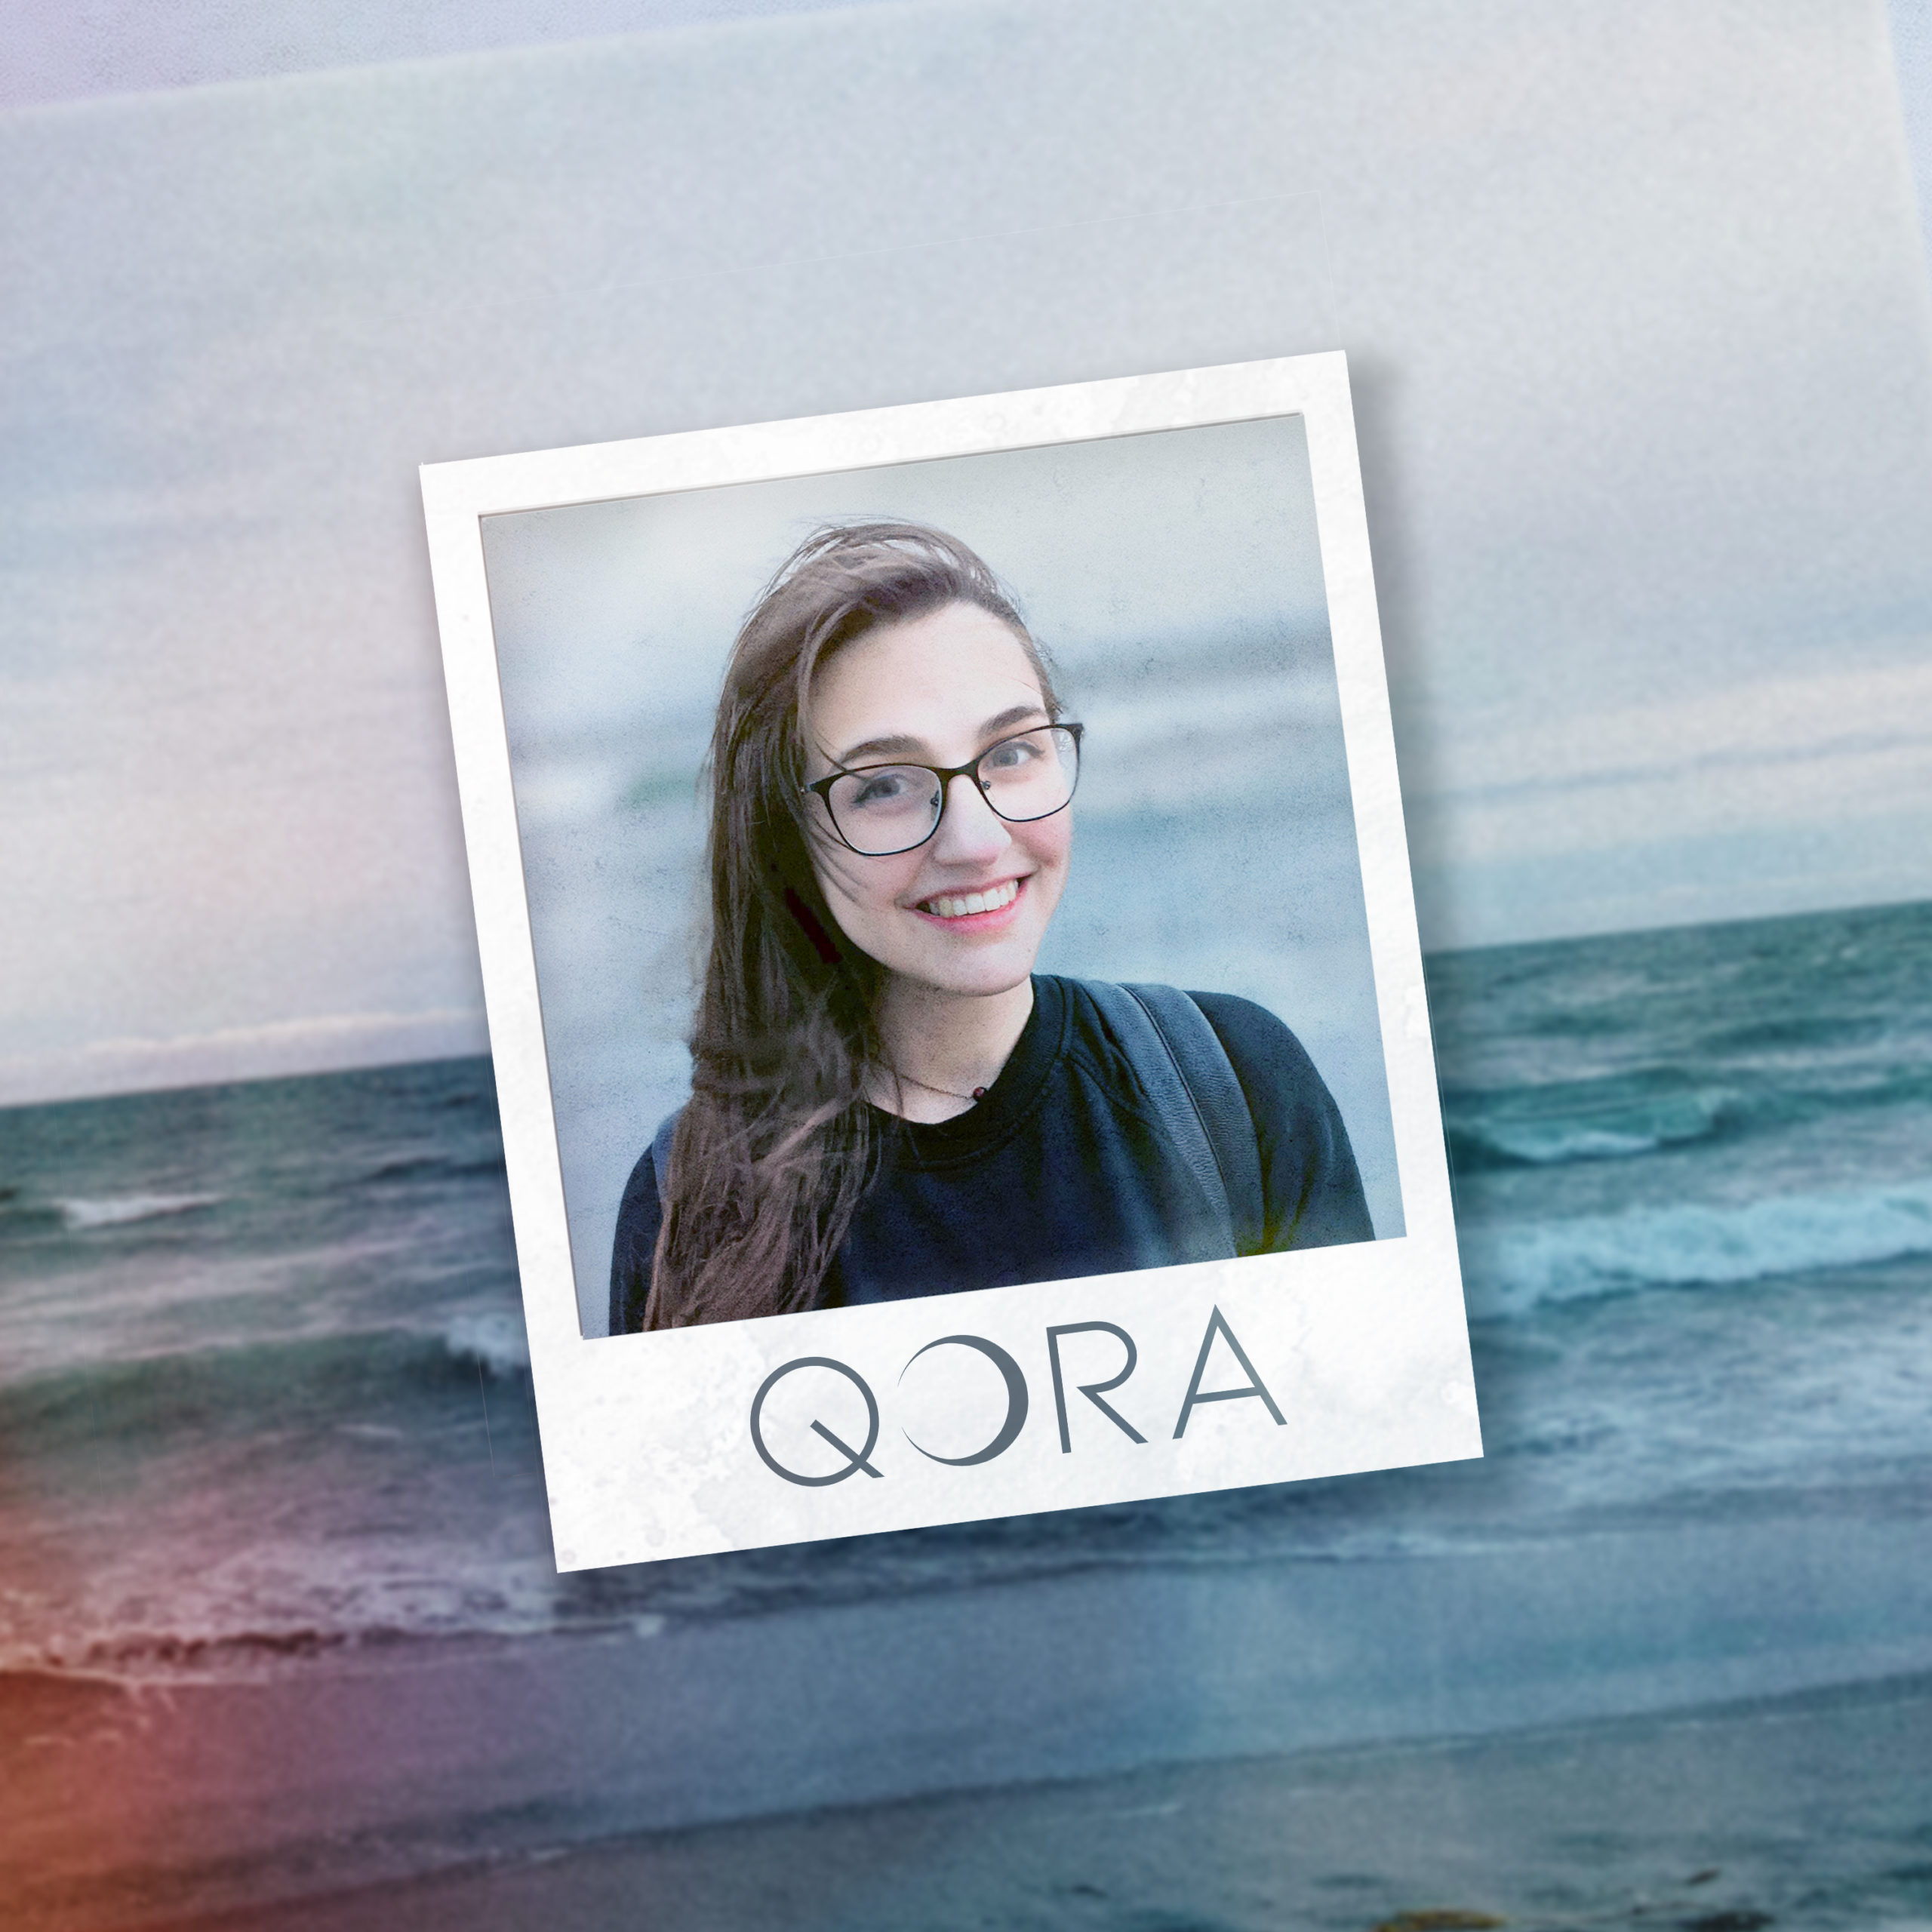 Ocean Waves – Dj Cutman & Qora